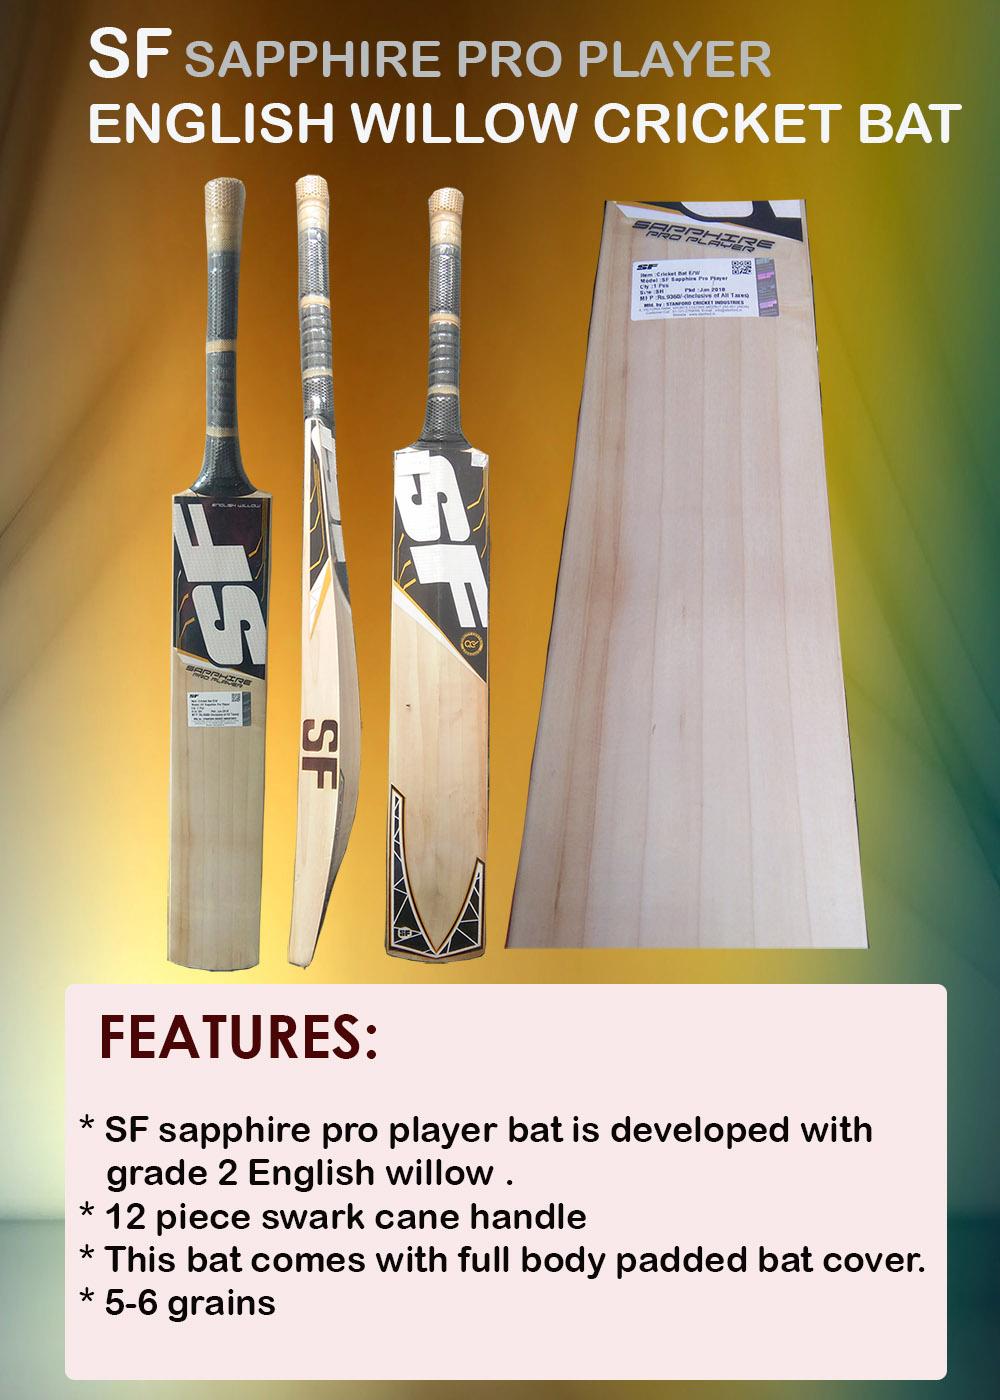 SF Sapphire Pro Player bat